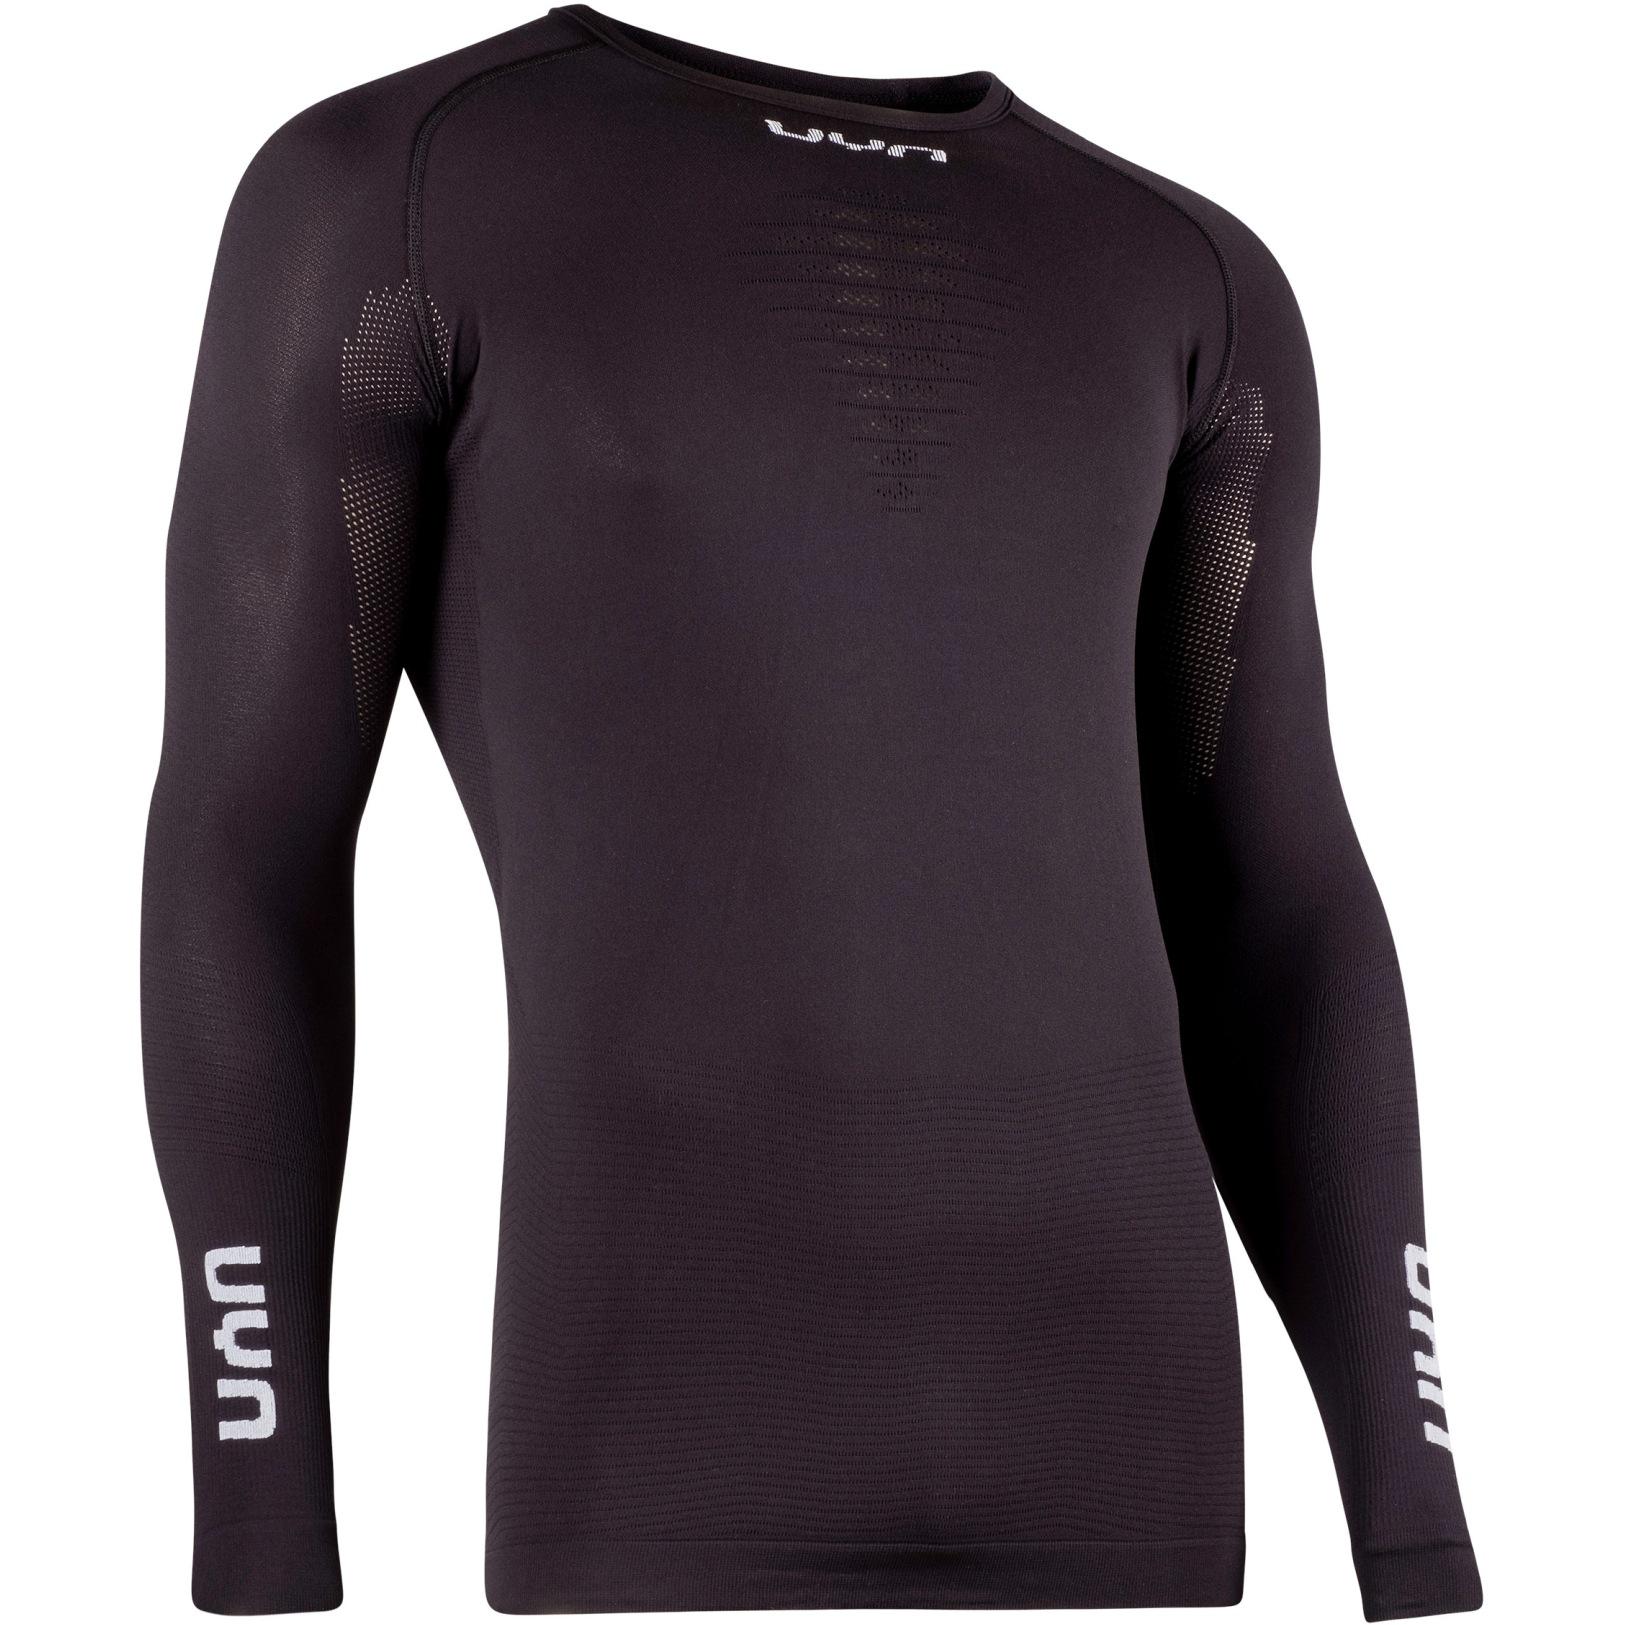 Image of UYN Energyon Man Long Sleeve Underwear Shirt - Black